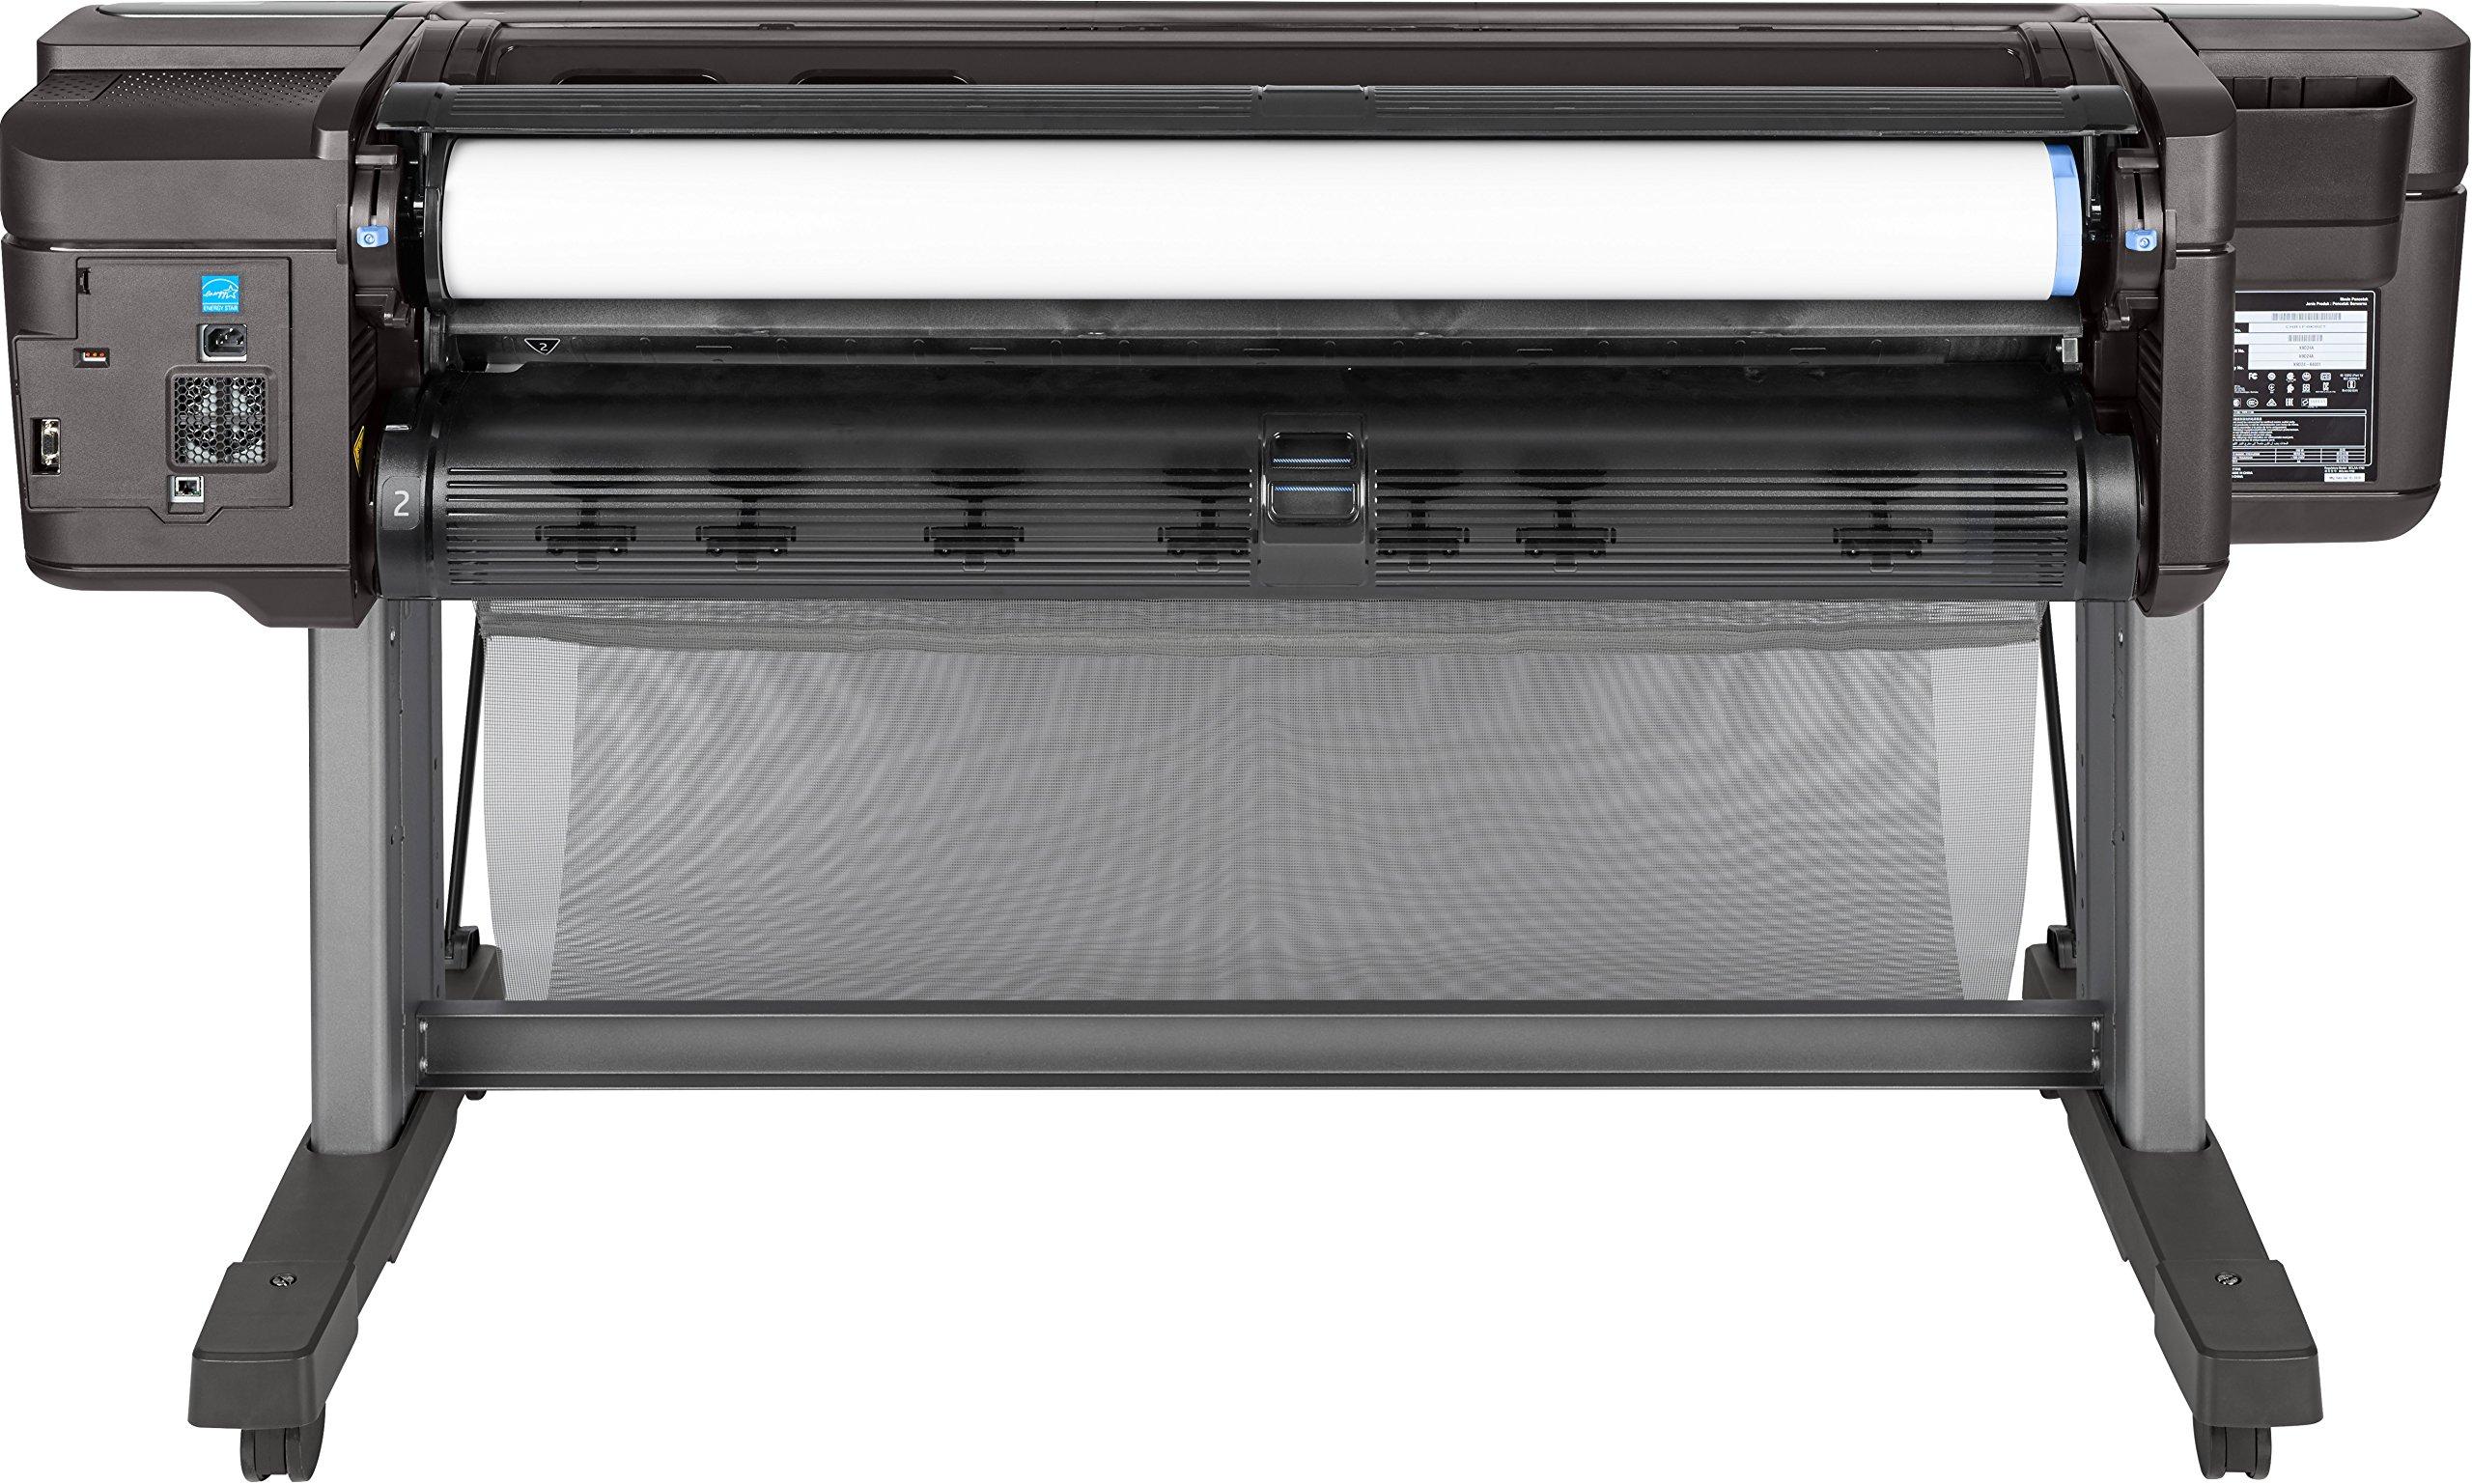 HP Designjet Z9 - Impresora de Gran Formato (2400 x 1200 dpi, Inyección de Tinta térmica, HP-GL/2,HP-RTL,PDF 1.7,Postscript 3, 8.7 m²/h, 4.5 m²/h, 1118 x 1676): Hp: Amazon.es: Informática